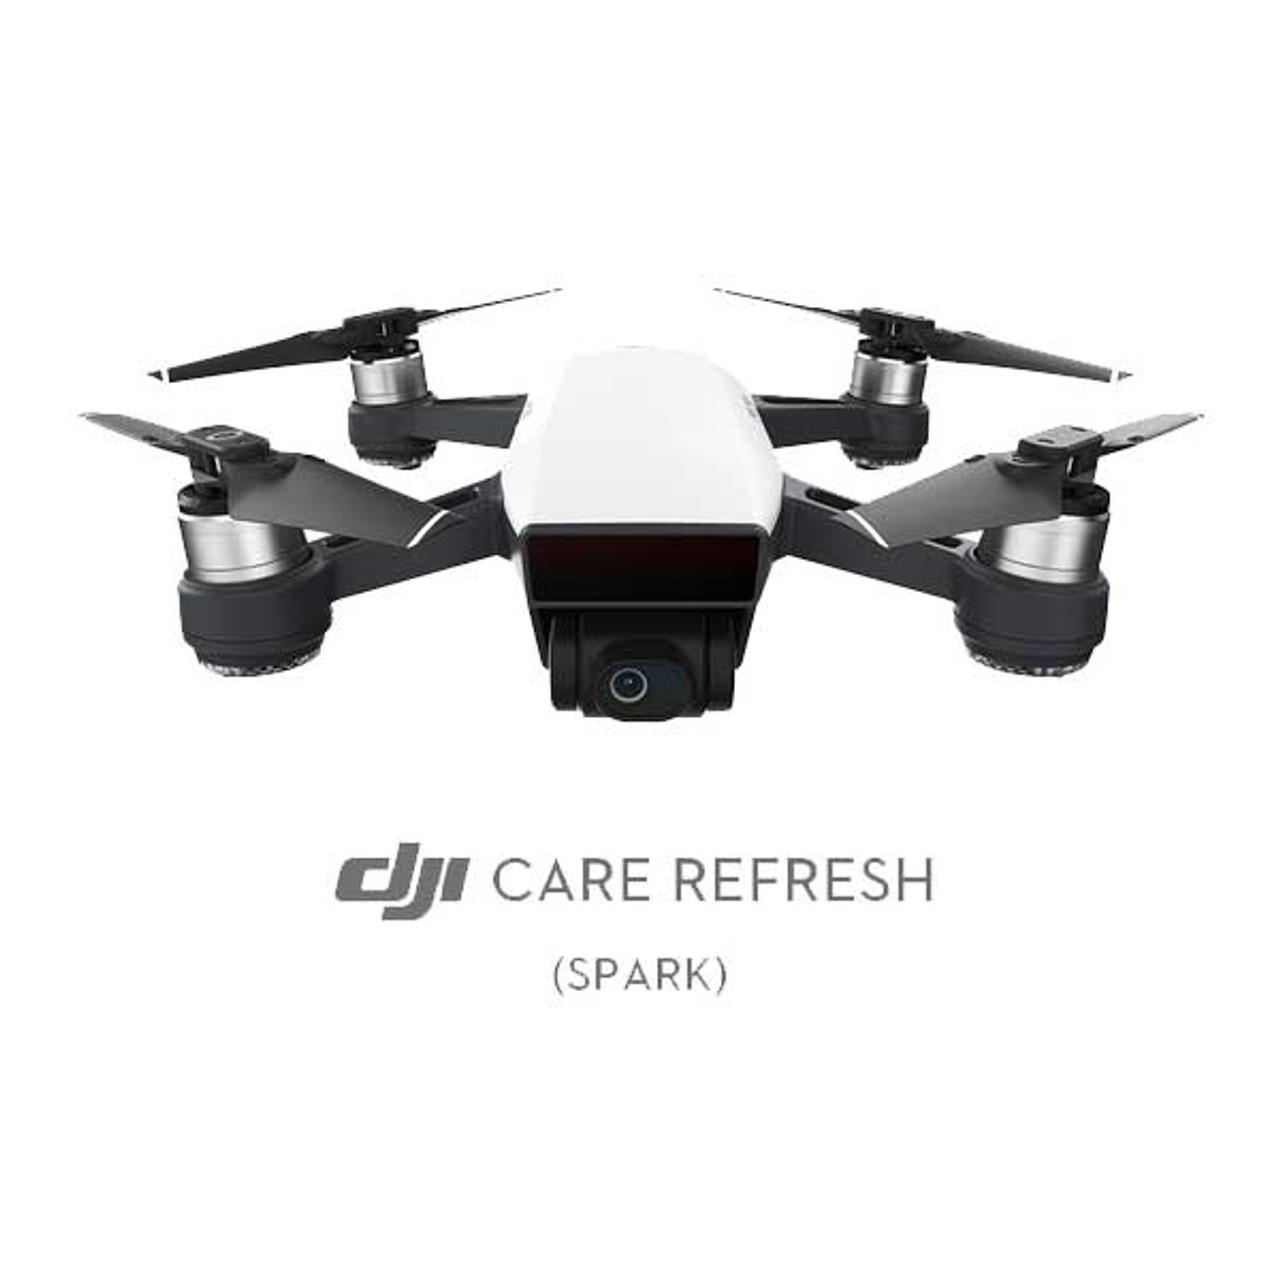 DJI Care Refresh Card - Spark